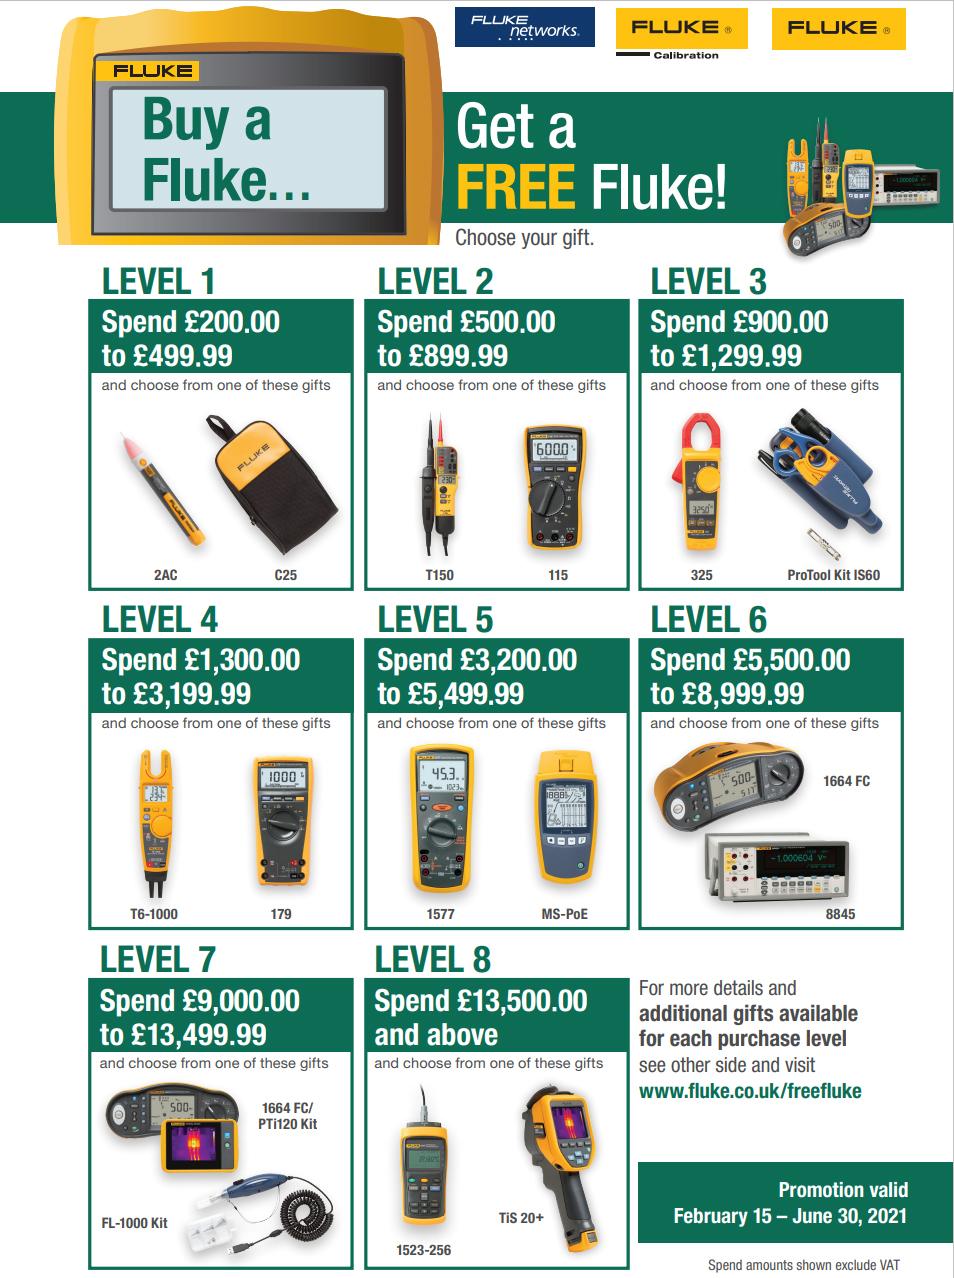 Buy FLUKE get FREE FLUKE Page 1